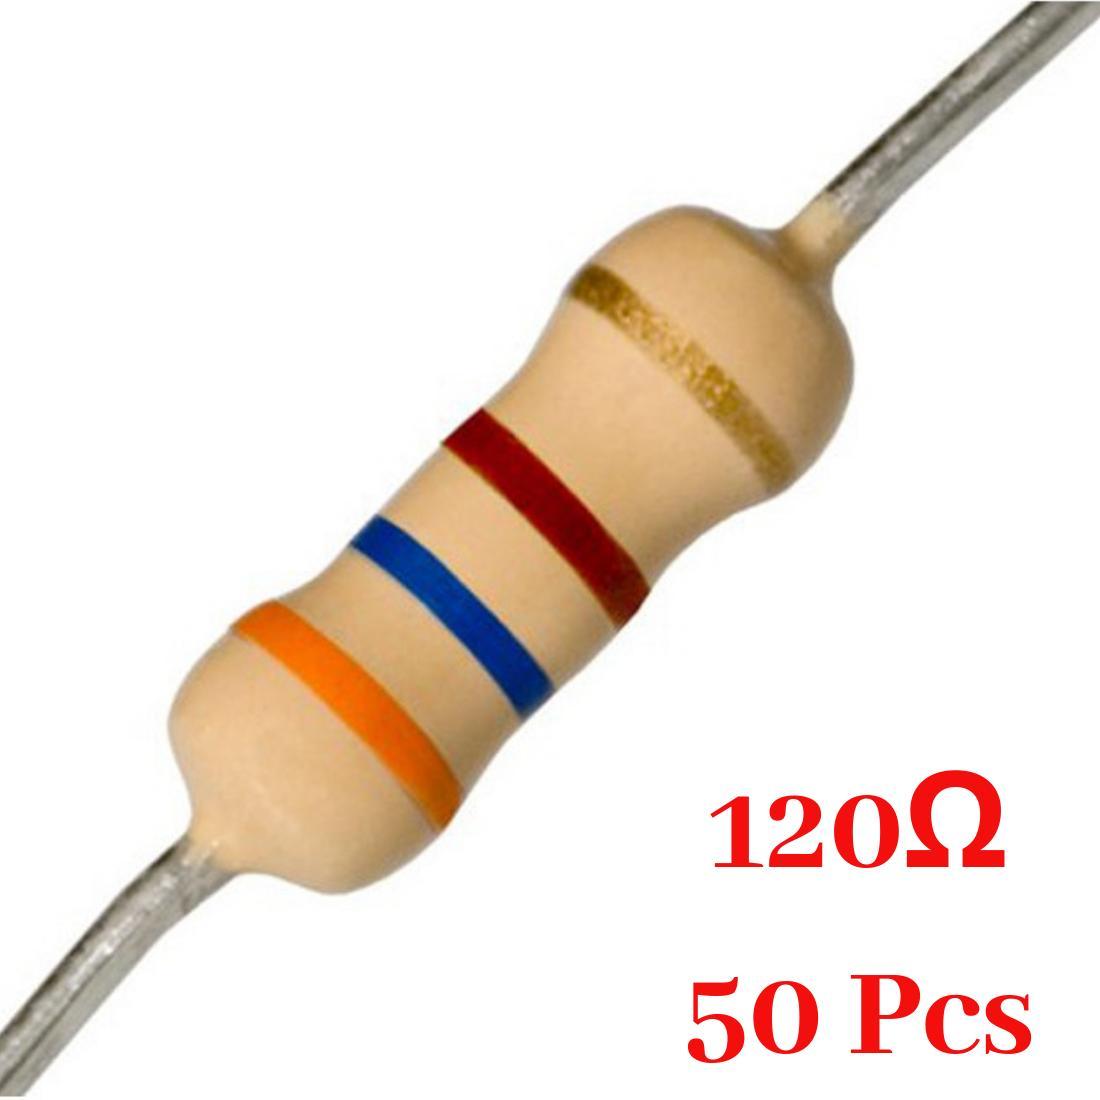 50 Pcs- 120 Ohm resistor